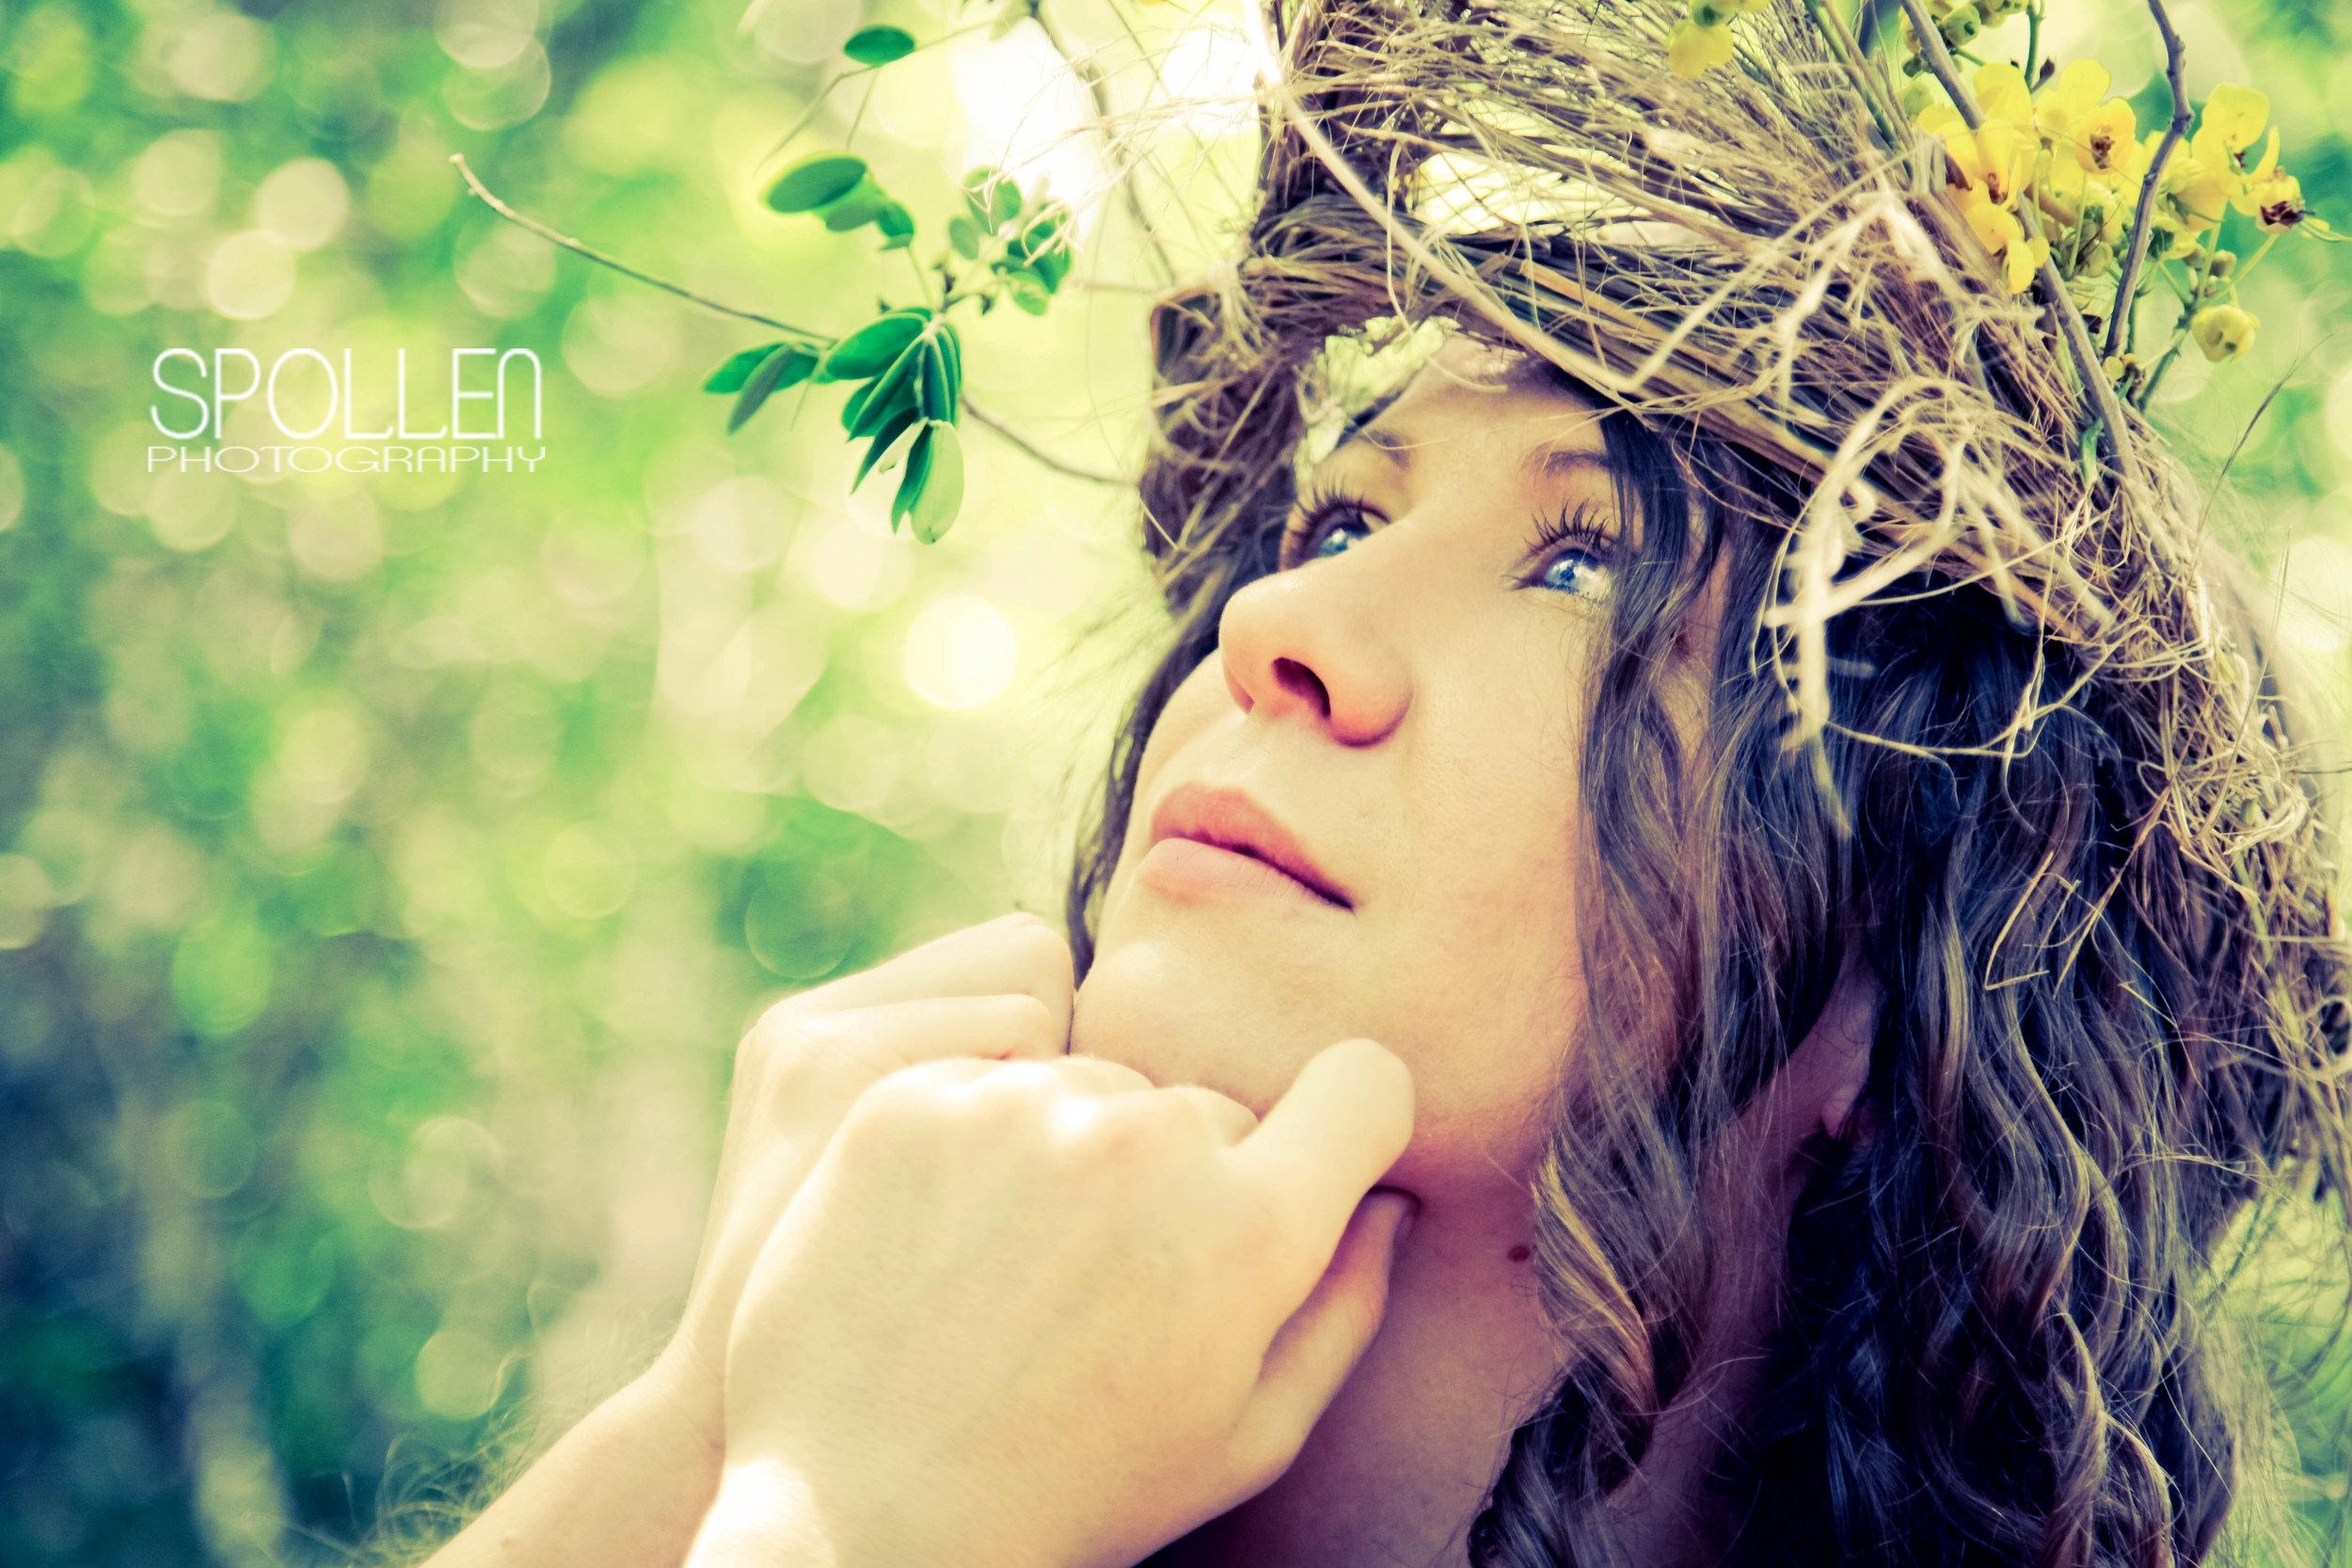 ©Victor Spollen Photography